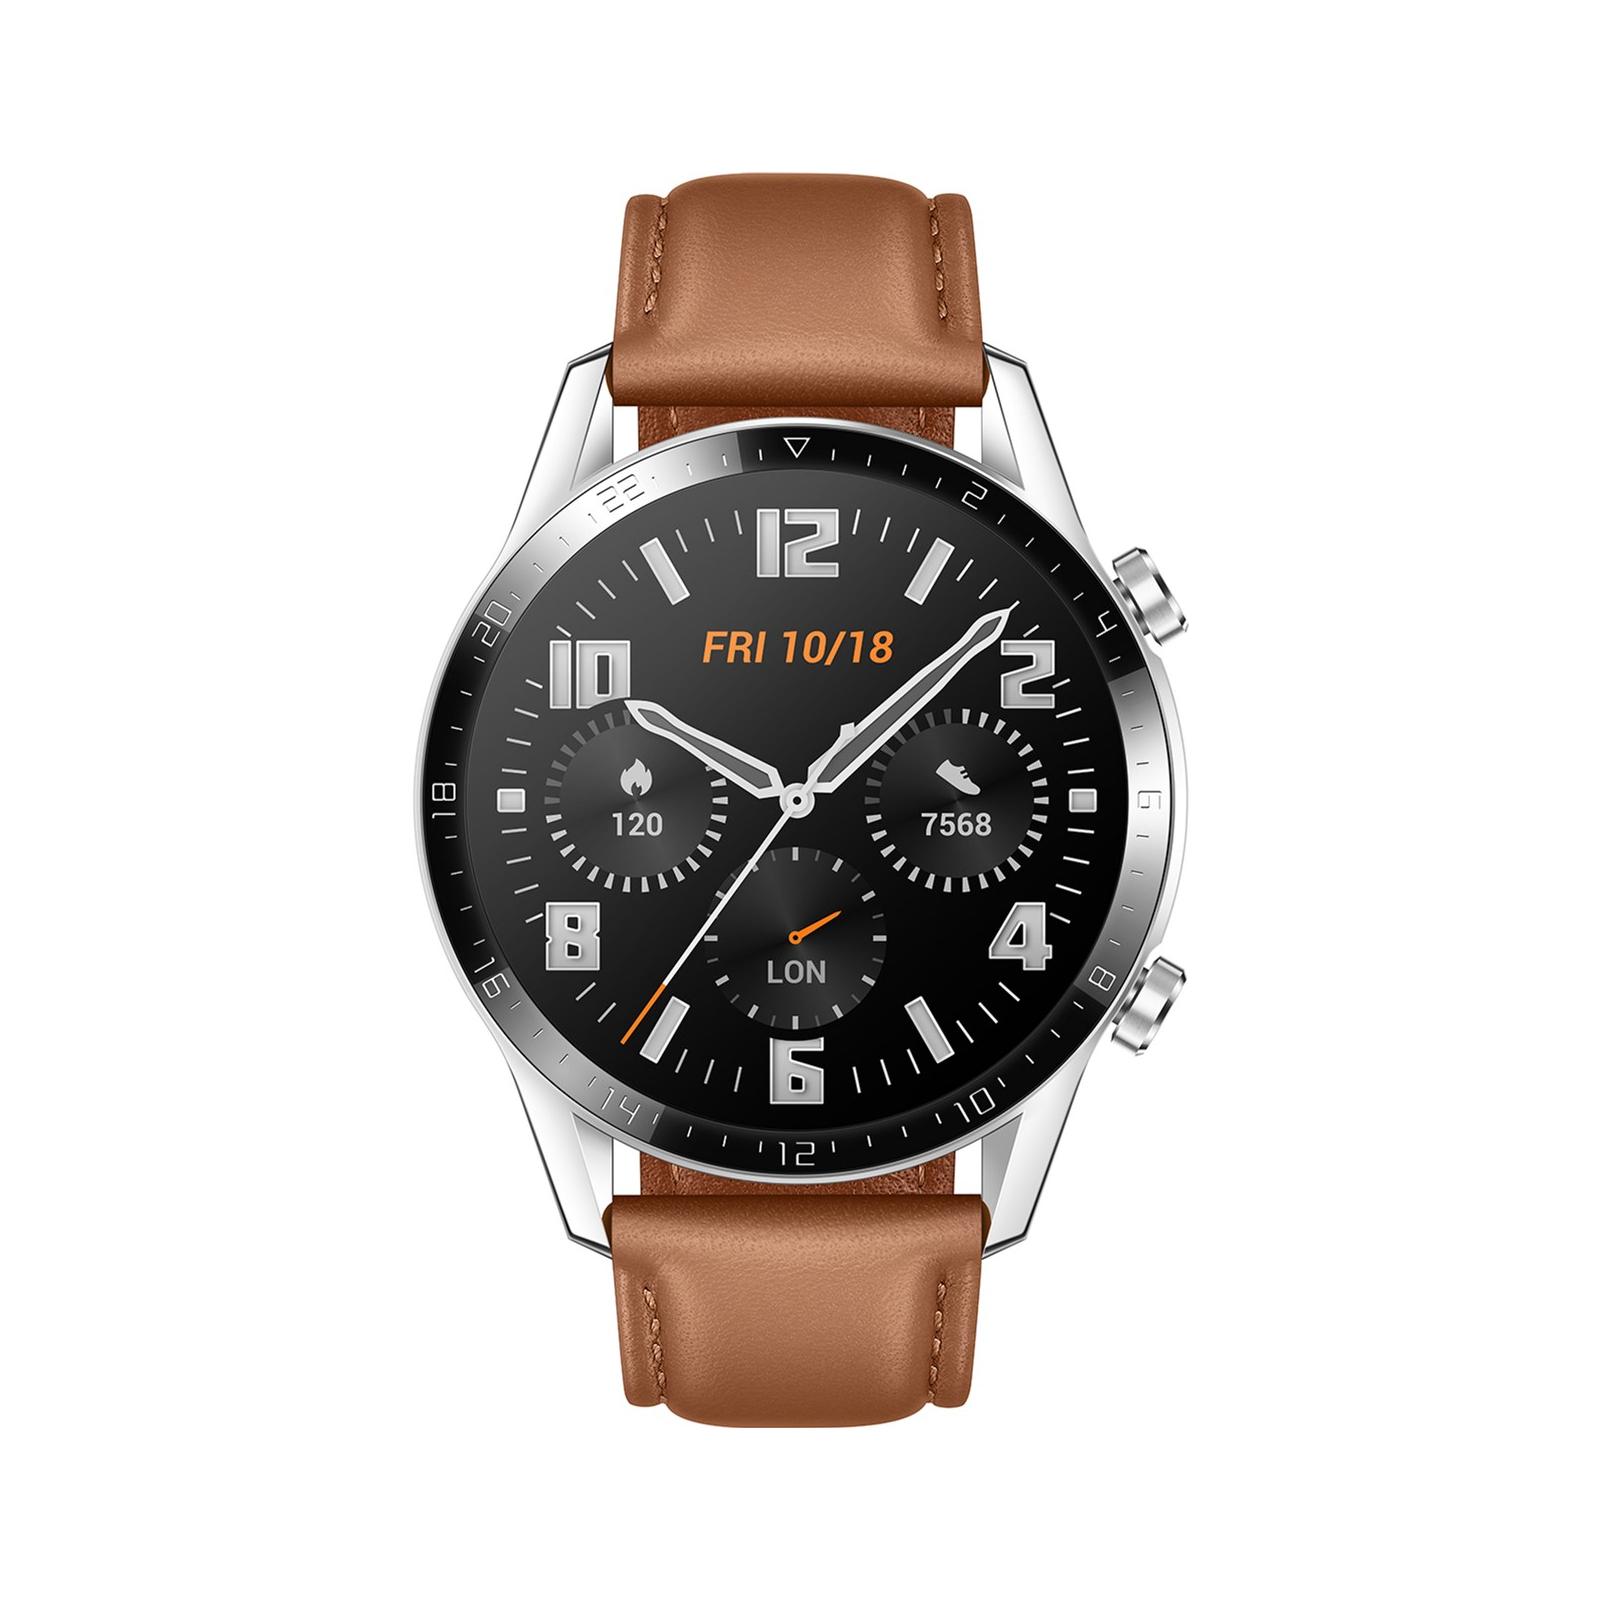 Смарт-часы Huawei Watch GT 2 46mm Classic Silver BROWN шкіра (Latona-B19V) (55024470) изображение 2